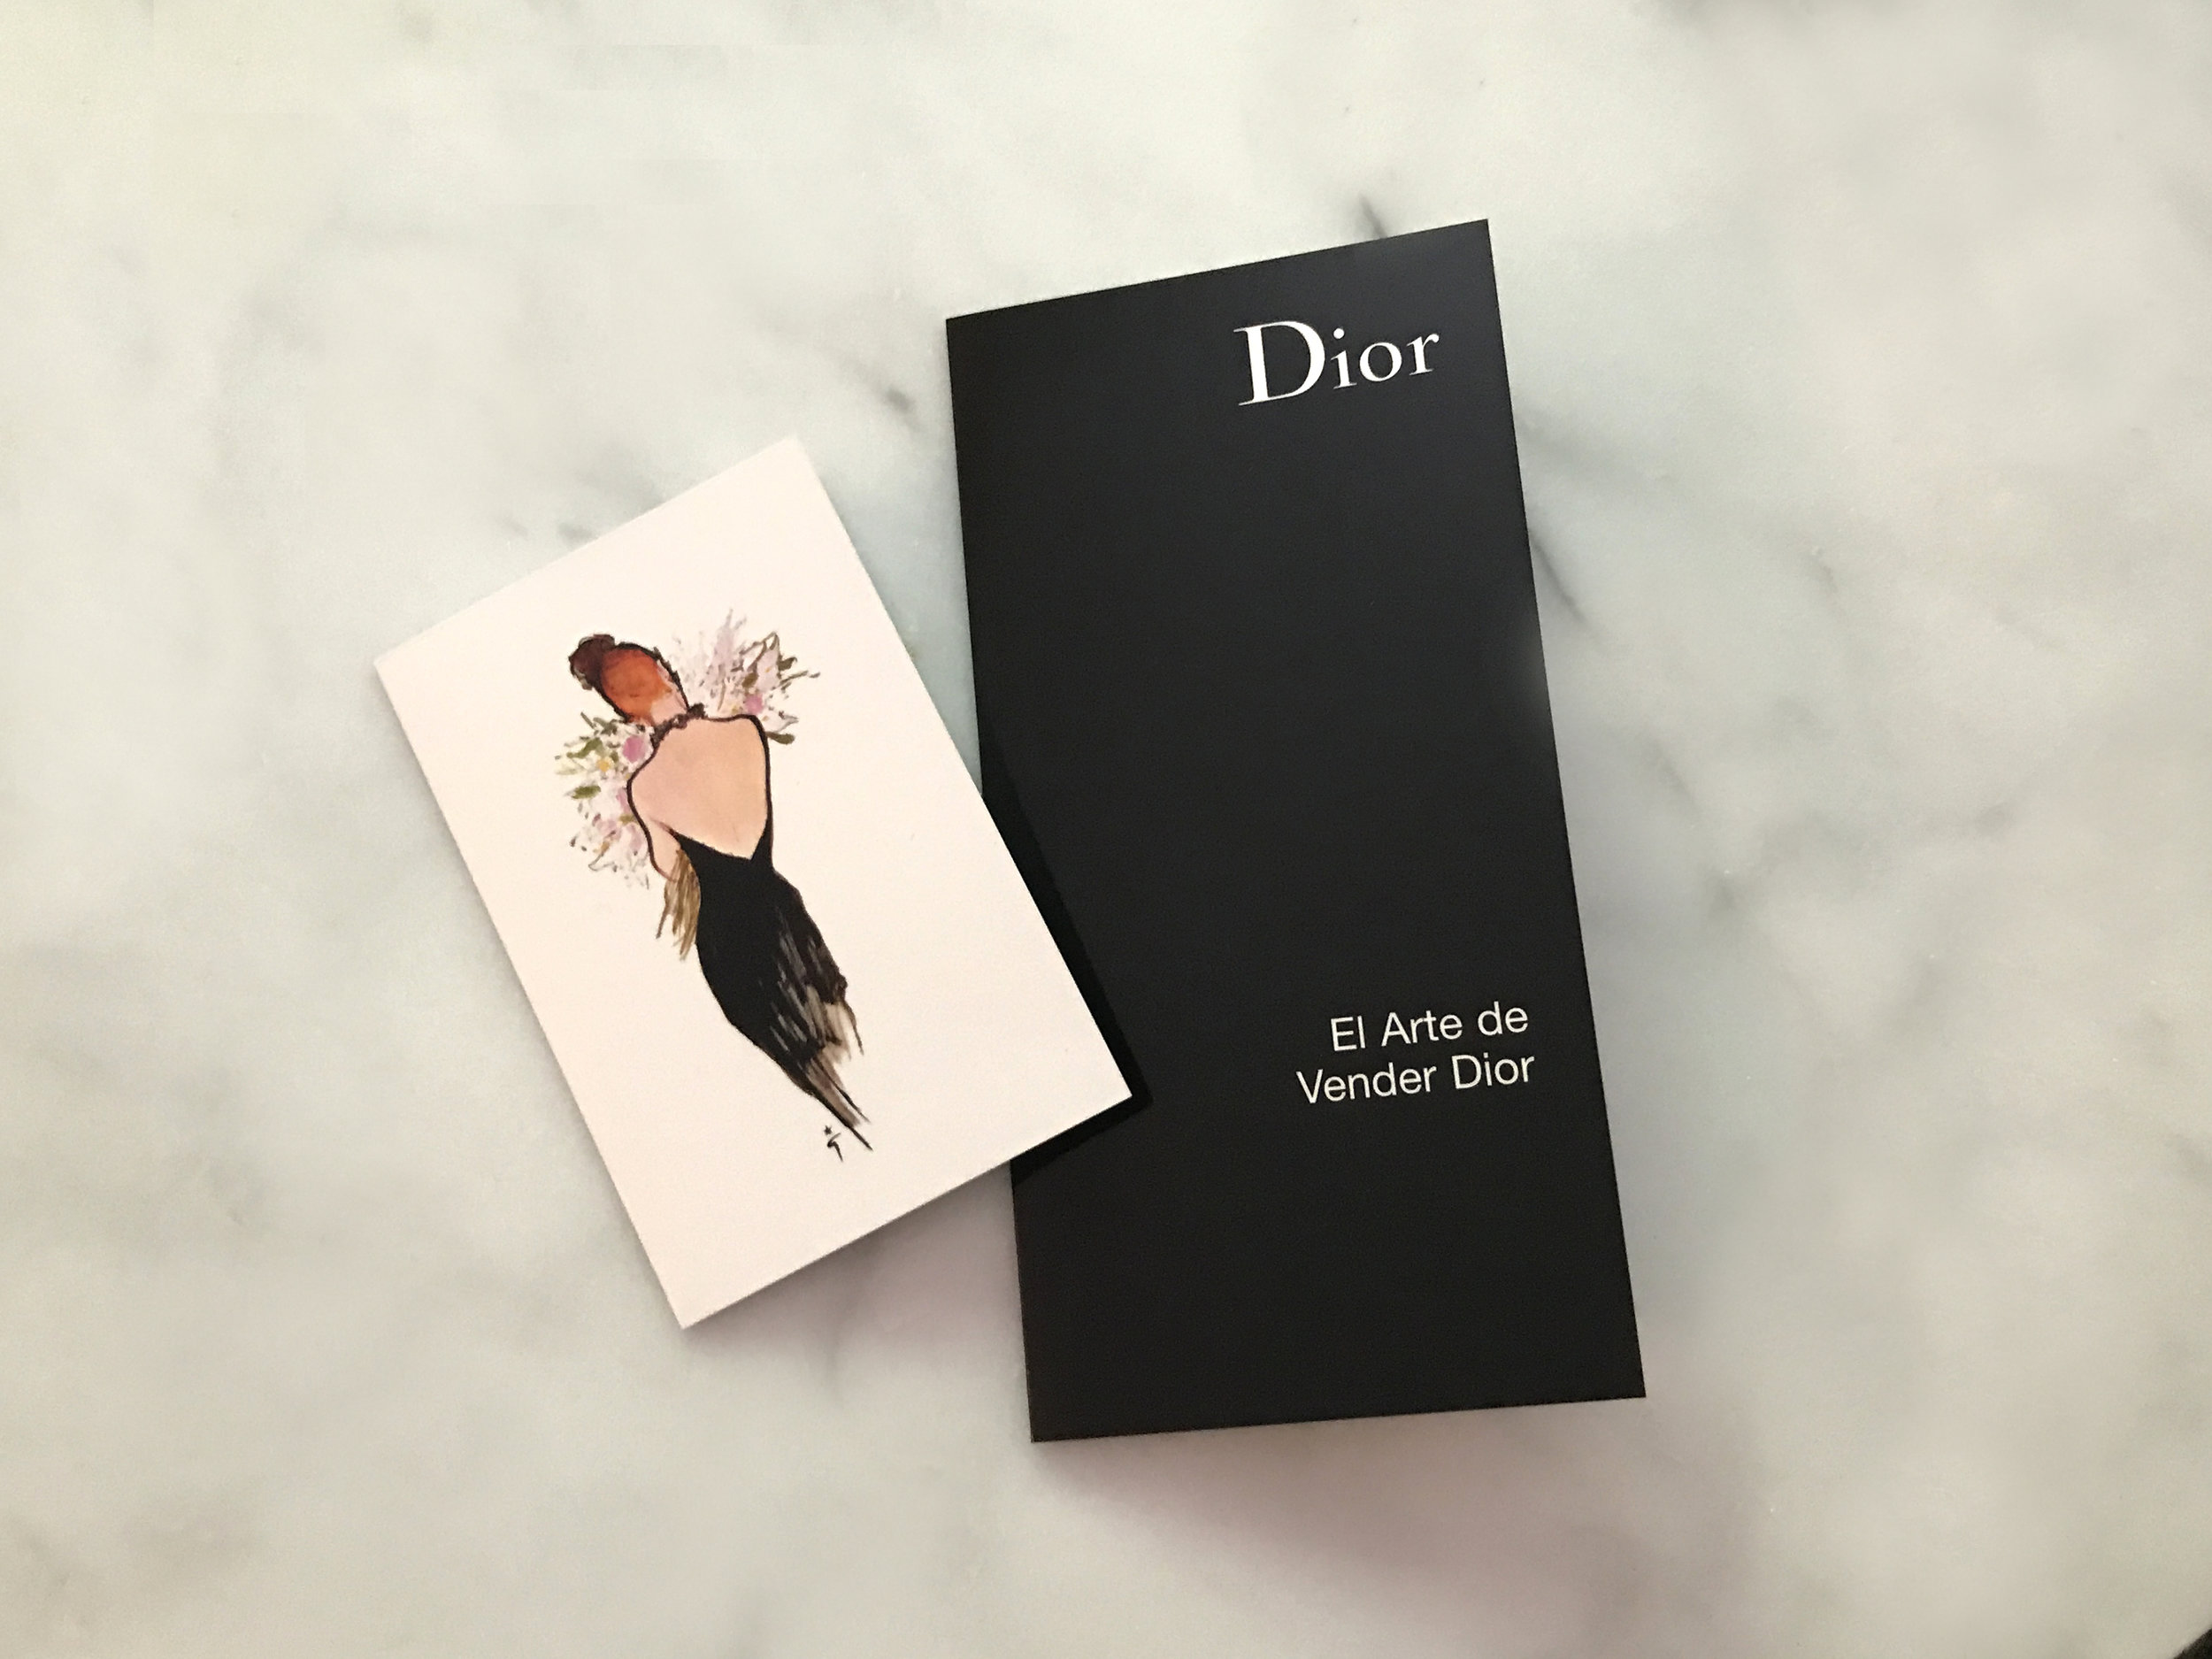 Dior3.jpg